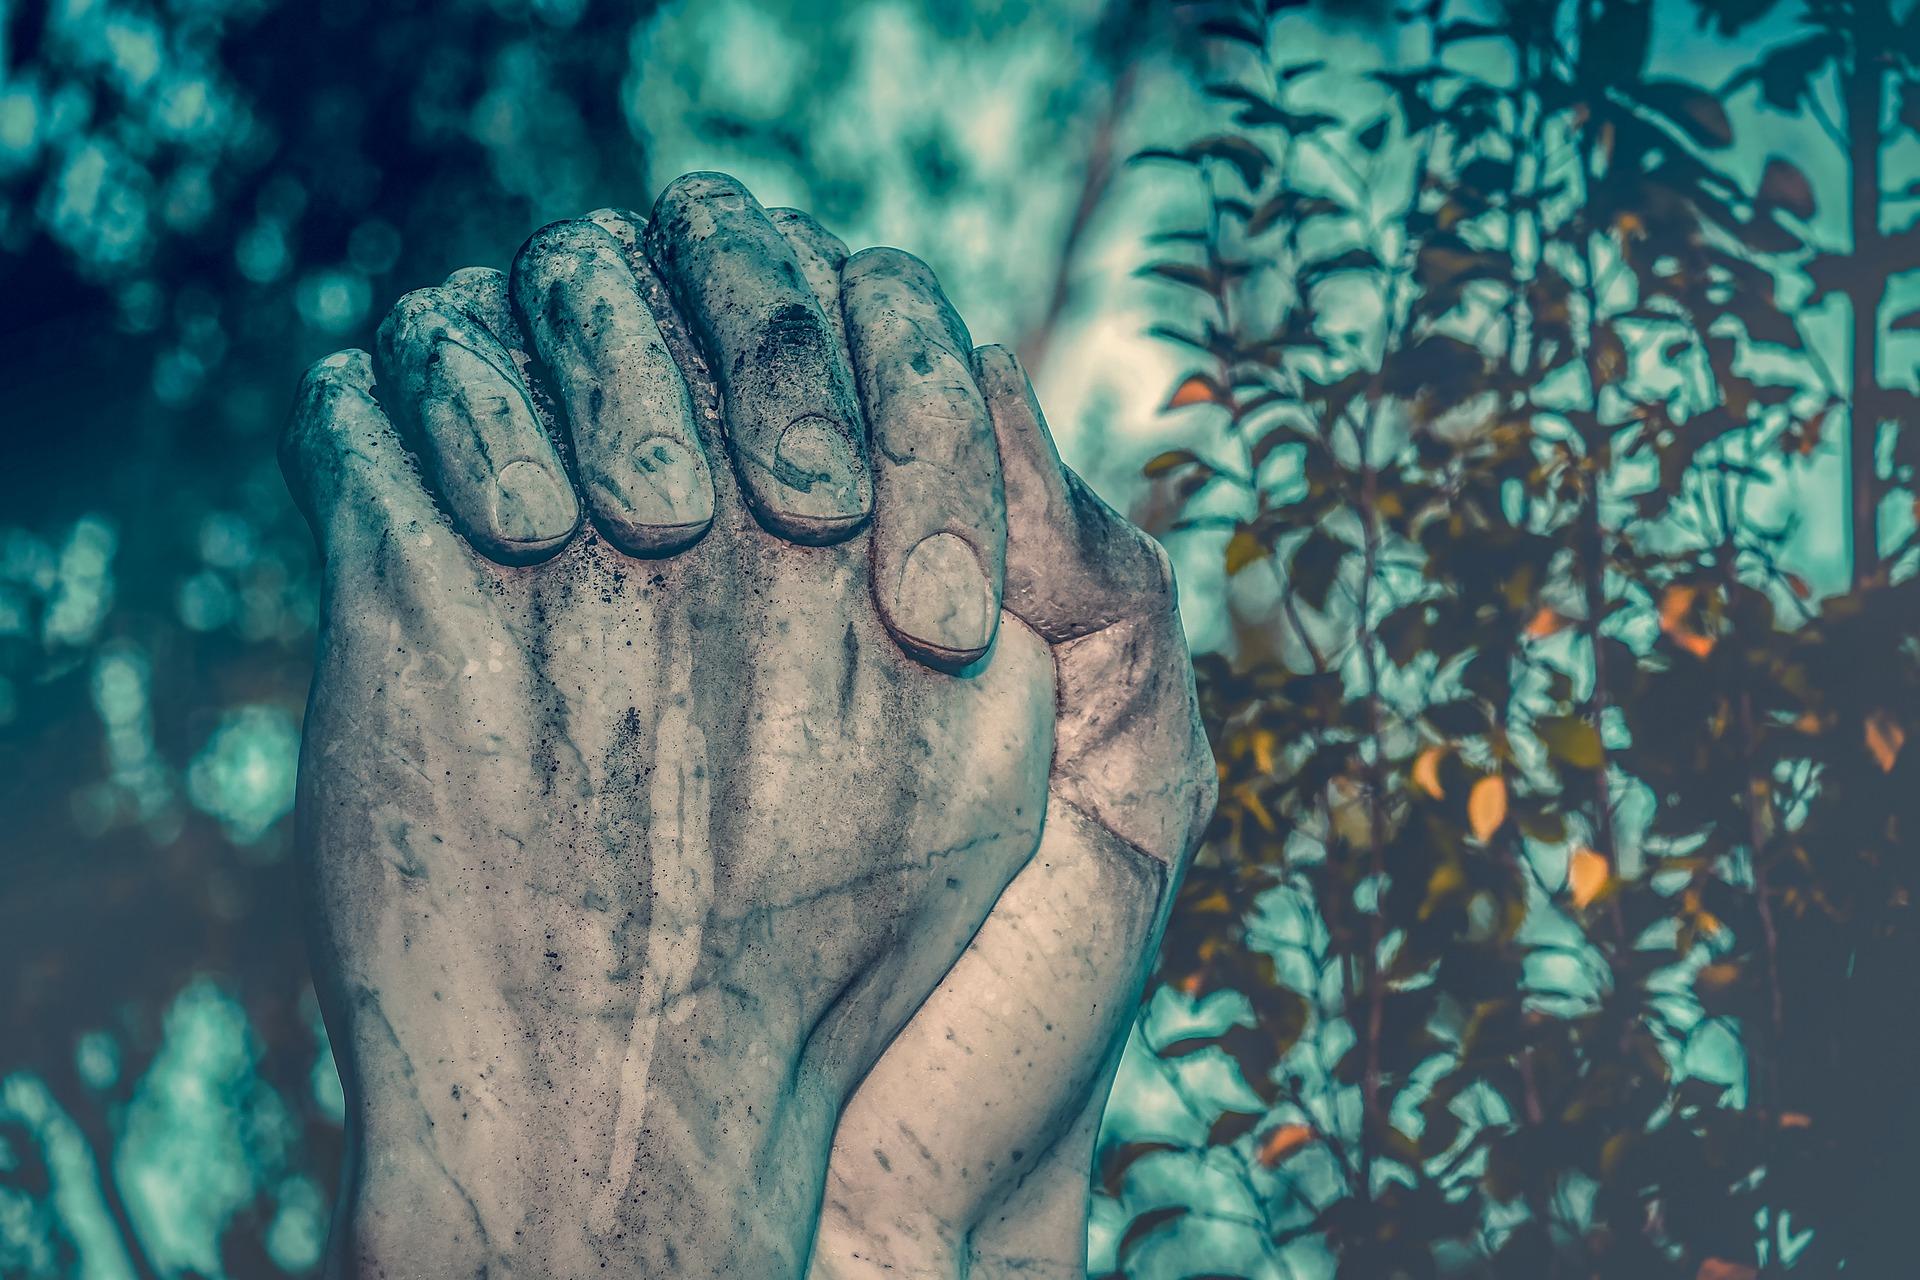 rugaciune pentru copii - sfatulparintilor.ro - pixabay_com - pray-3611519_1920